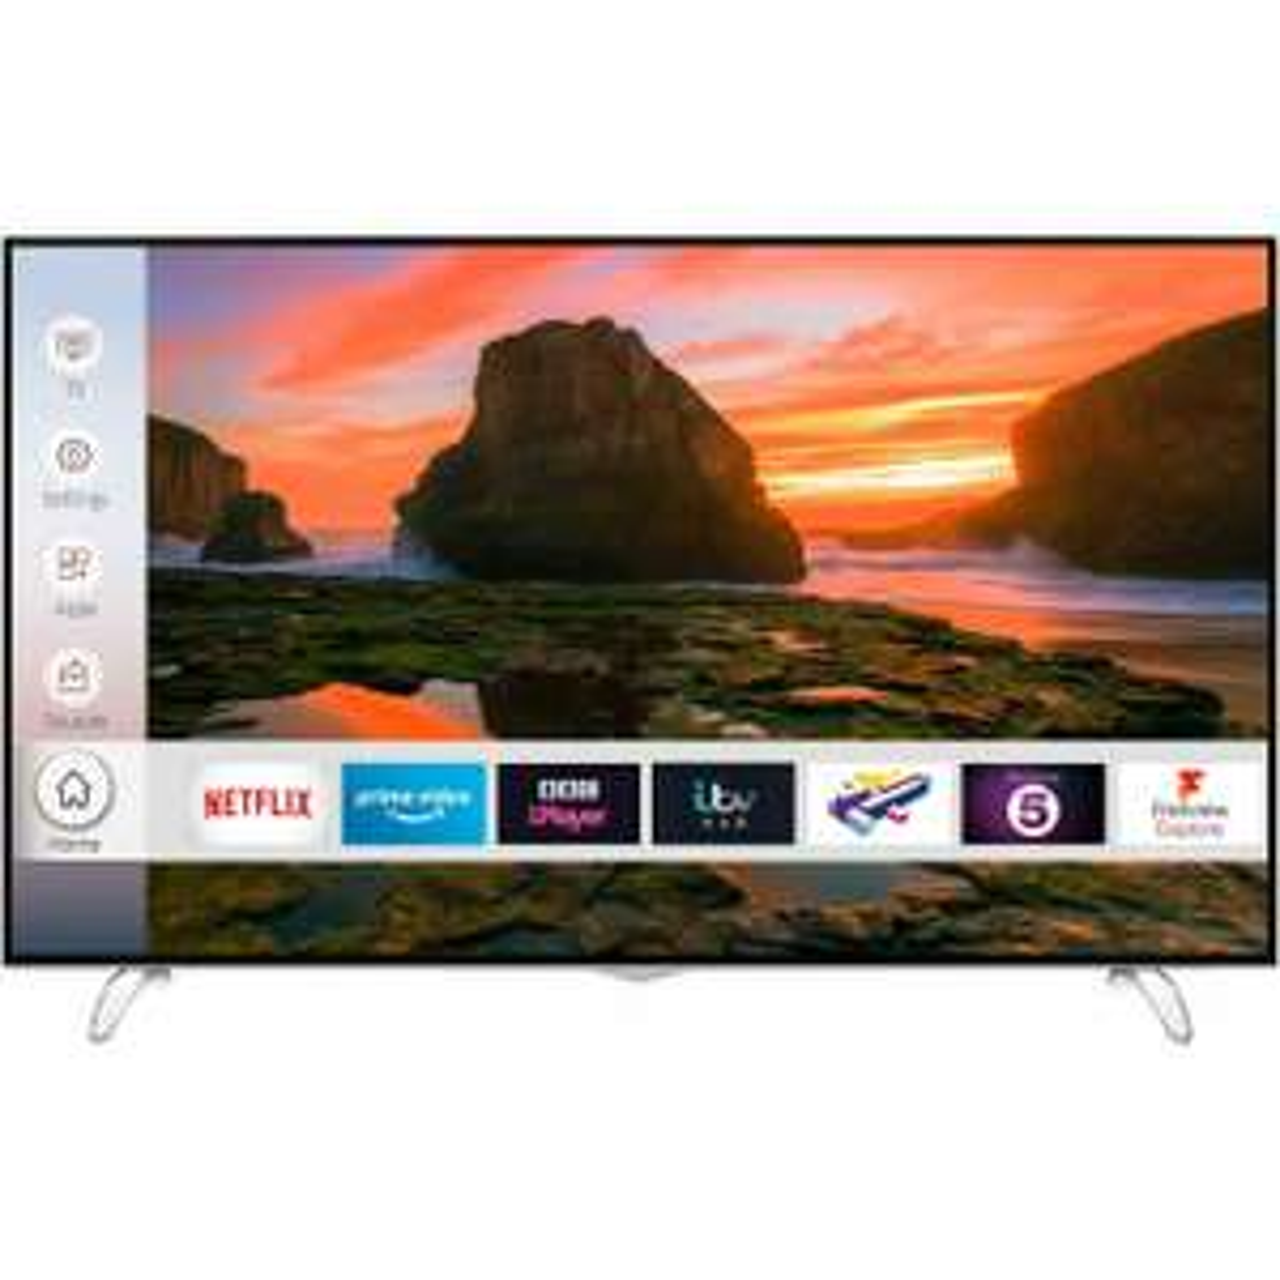 Techwood 65AO8UHD 65 Inch TV Smart 4K Ultra HD LED Freeview HD 3 HDMI WiFi at ao.com/ebay for £399